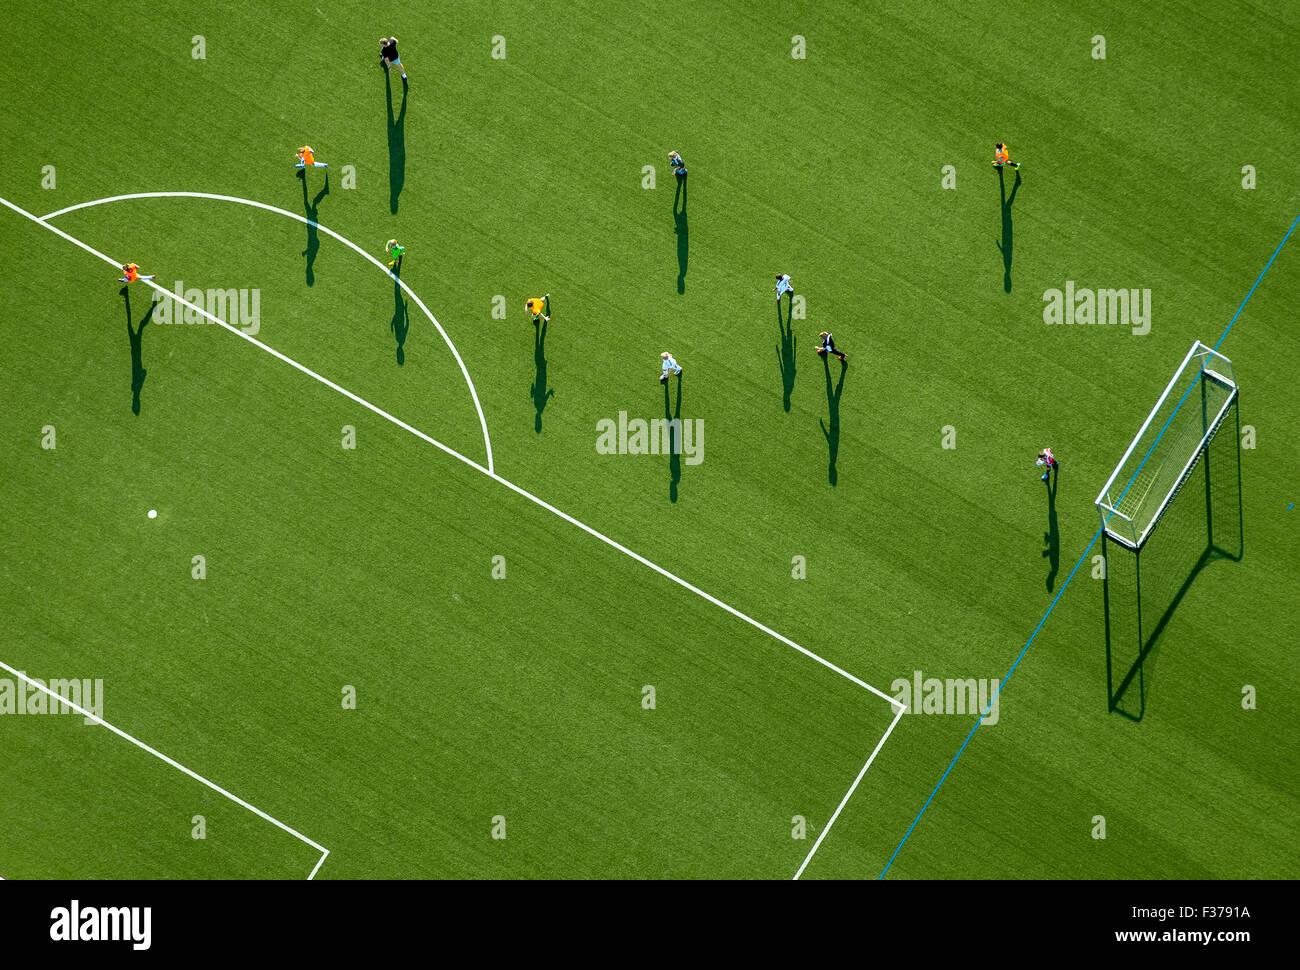 La formation du football sur un terrain de sport, le stade en Haßlinghausen, Sprockhövel, Rhénanie Photo Stock